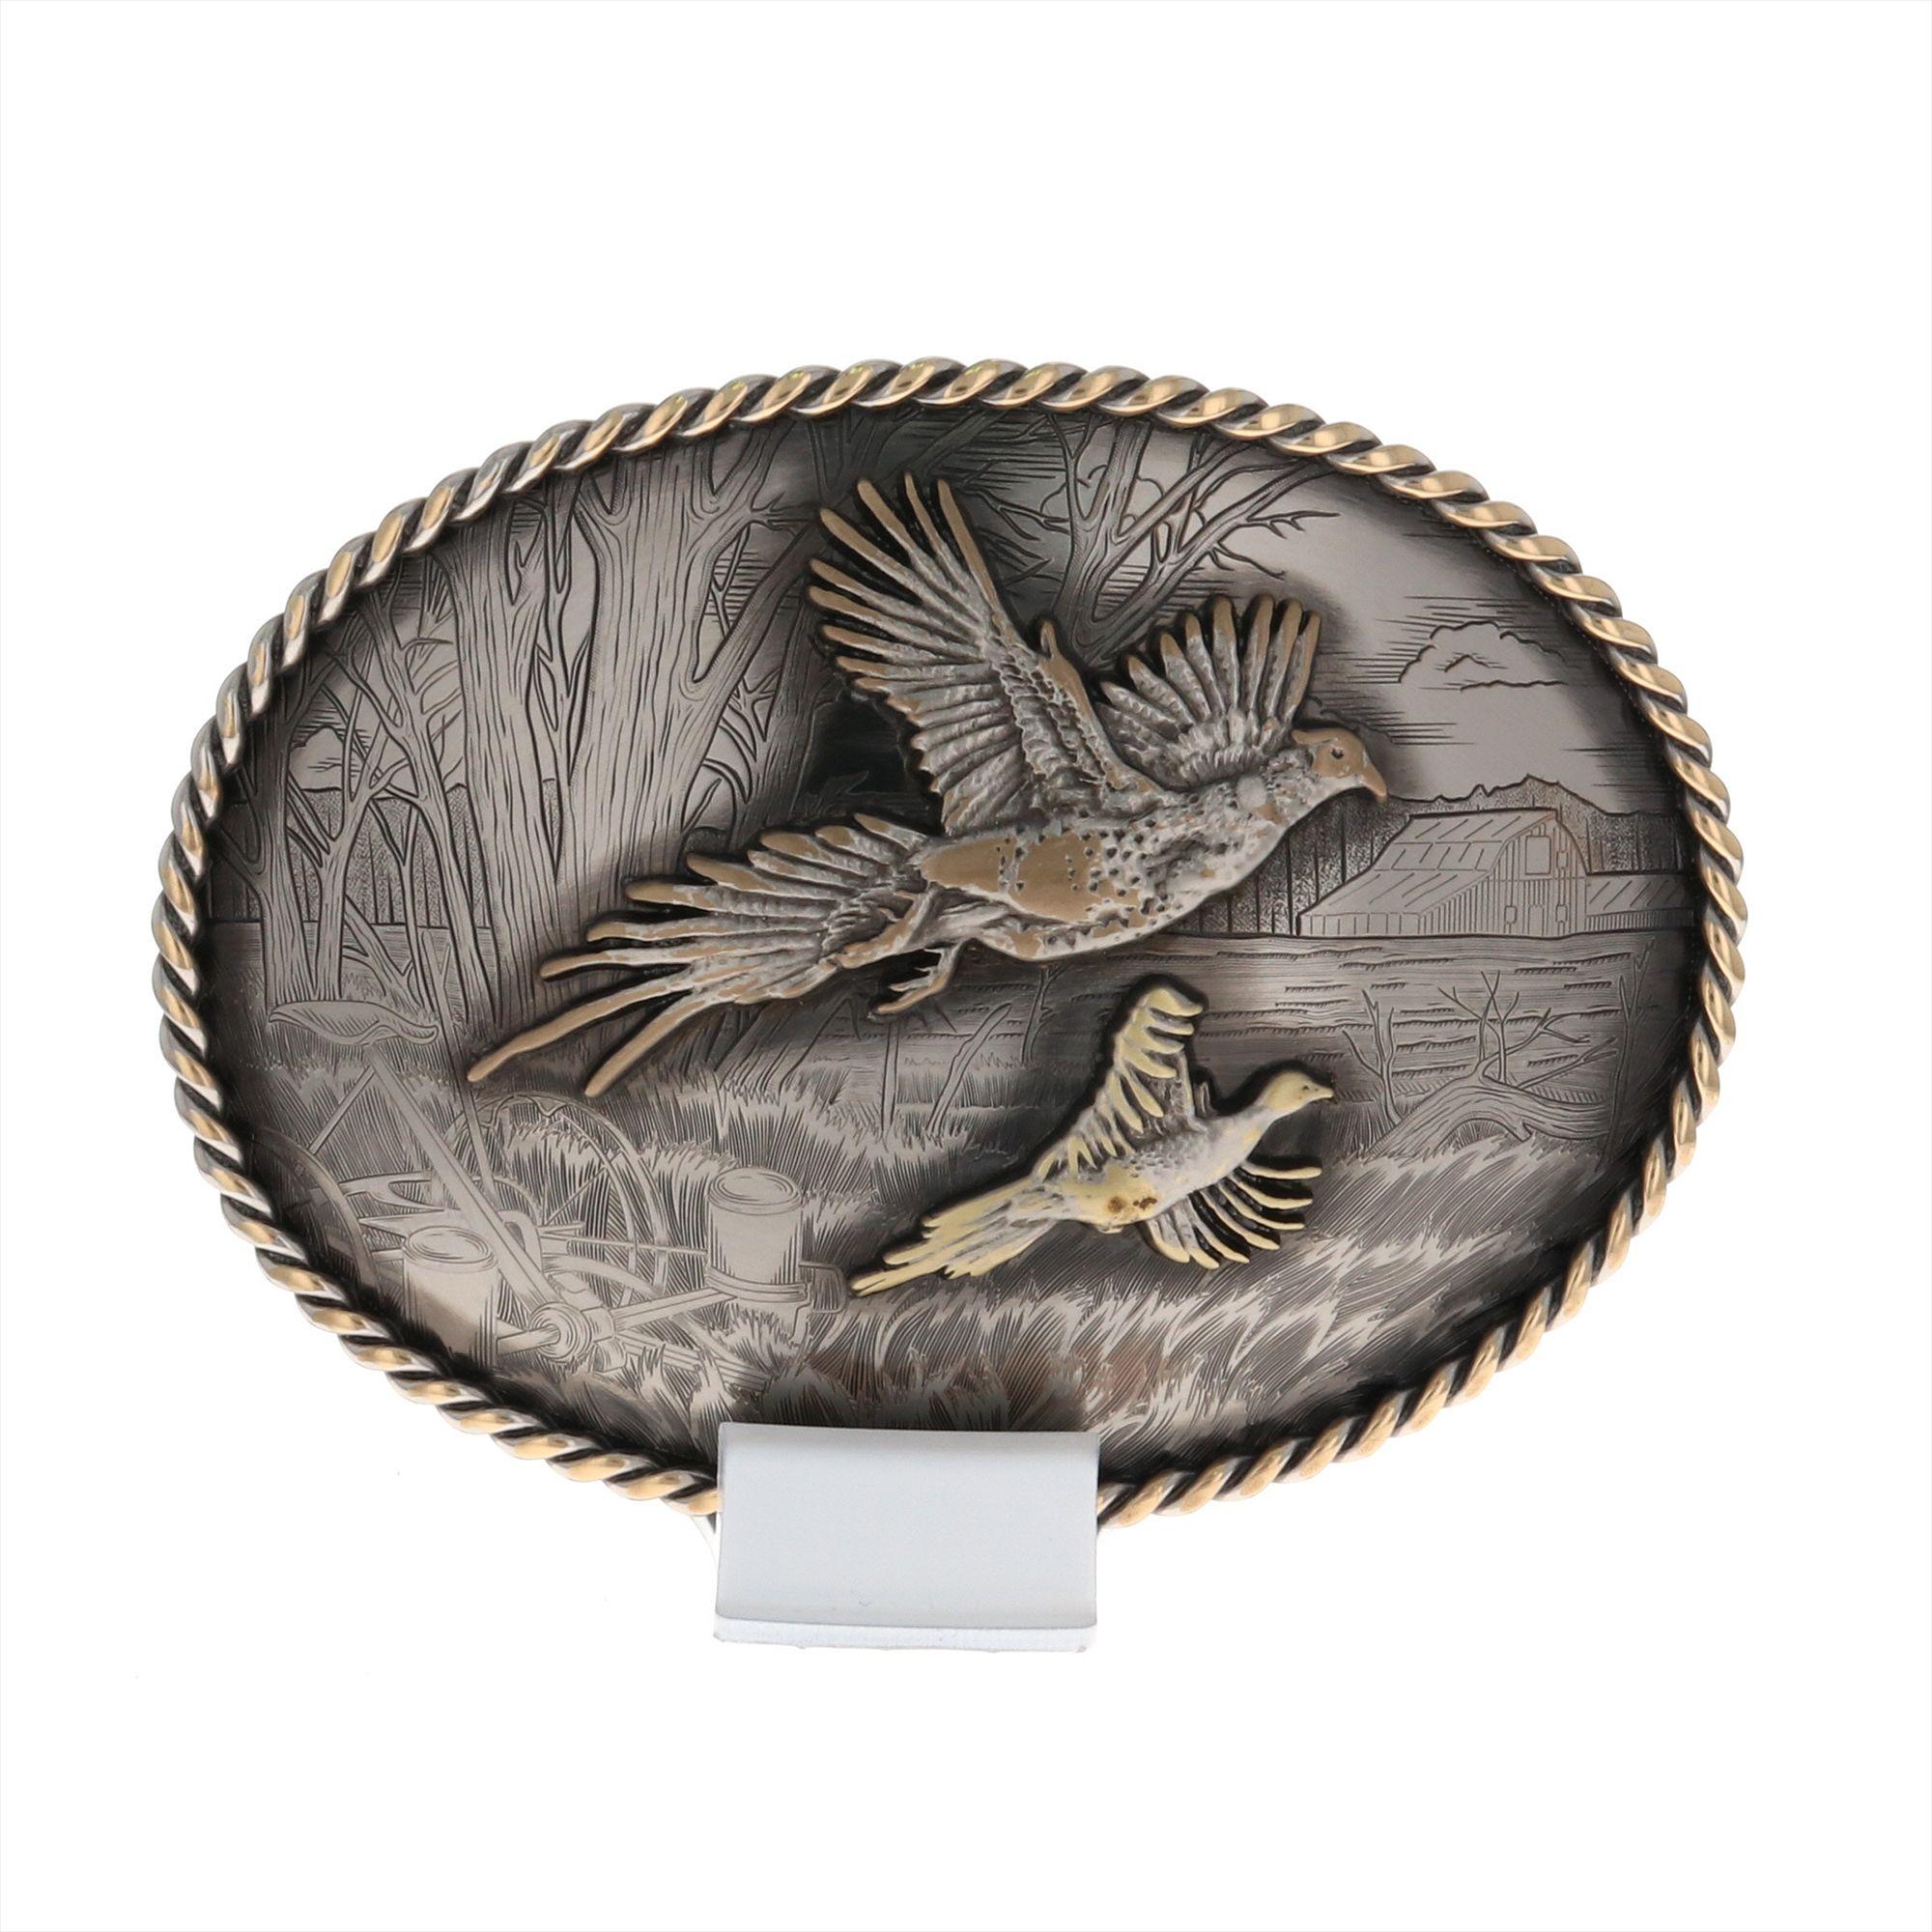 Vintage Bronze Rustic Buckle with Pheasants